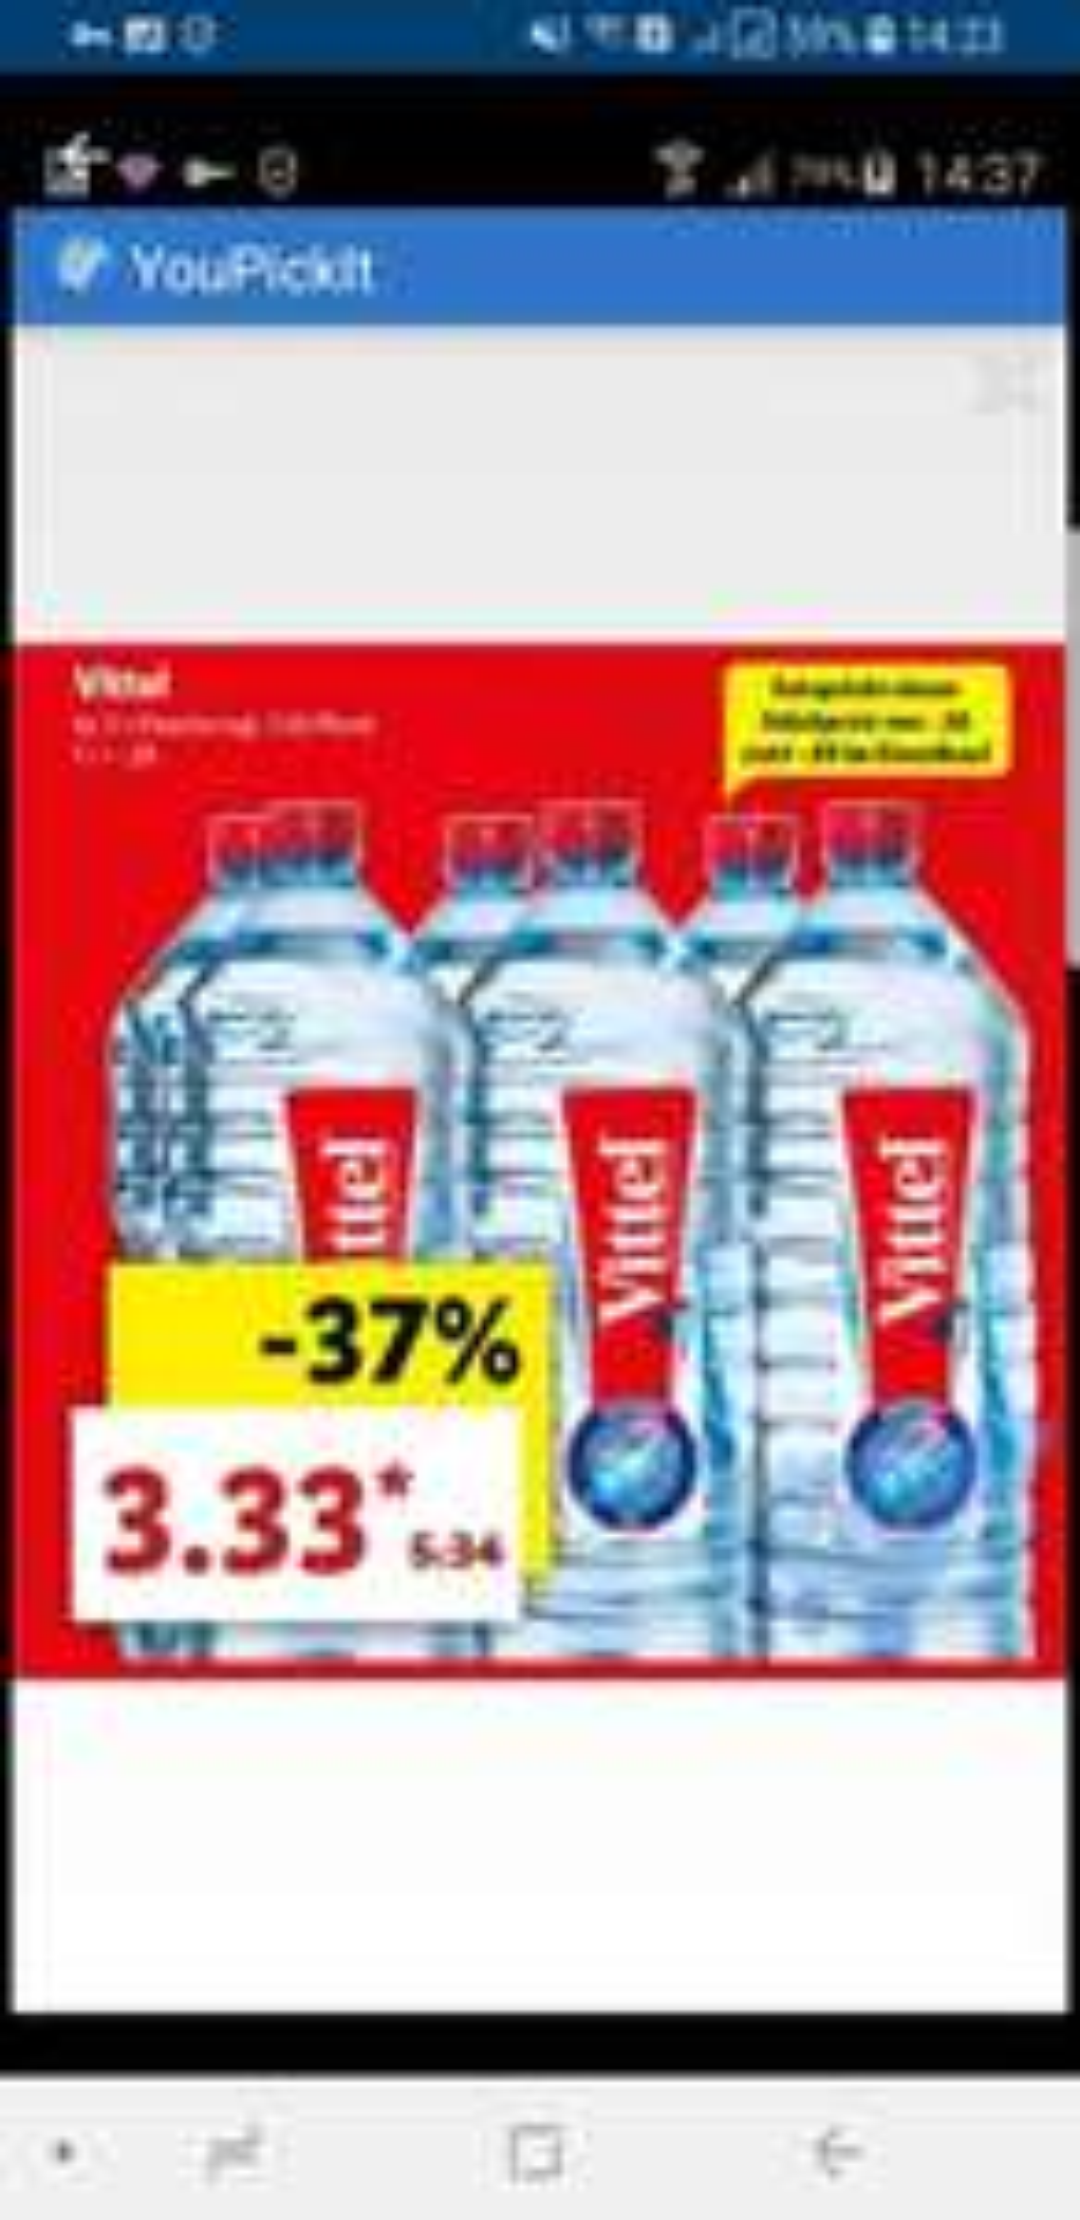 [LIDL] Vittel Wasser 6er Pack 2 Liter für 3.33€ statt5.34